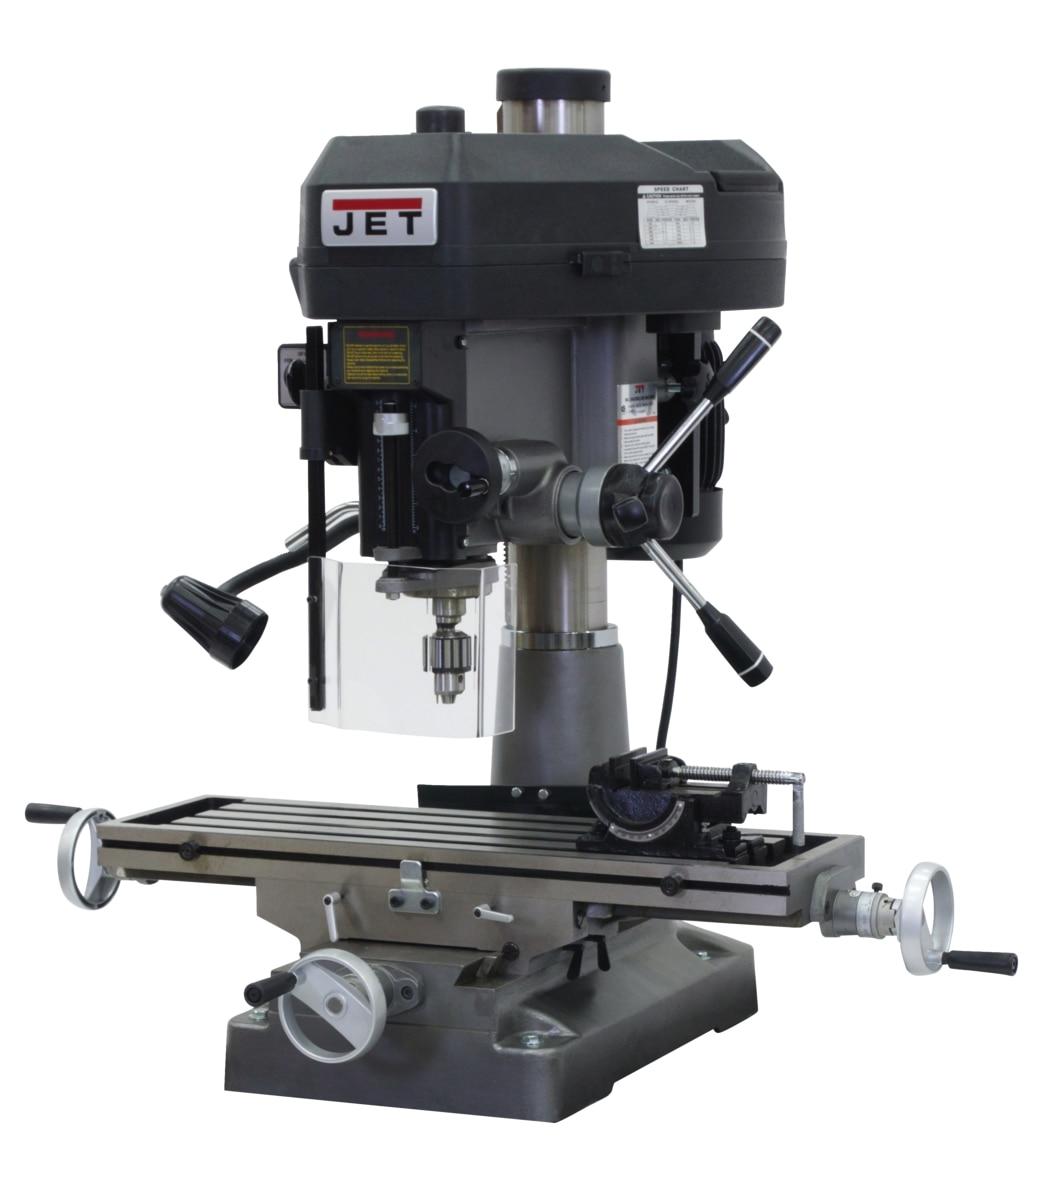 JMD-18 Mill/Drill With R-8 Taper 115/230V 1Ph